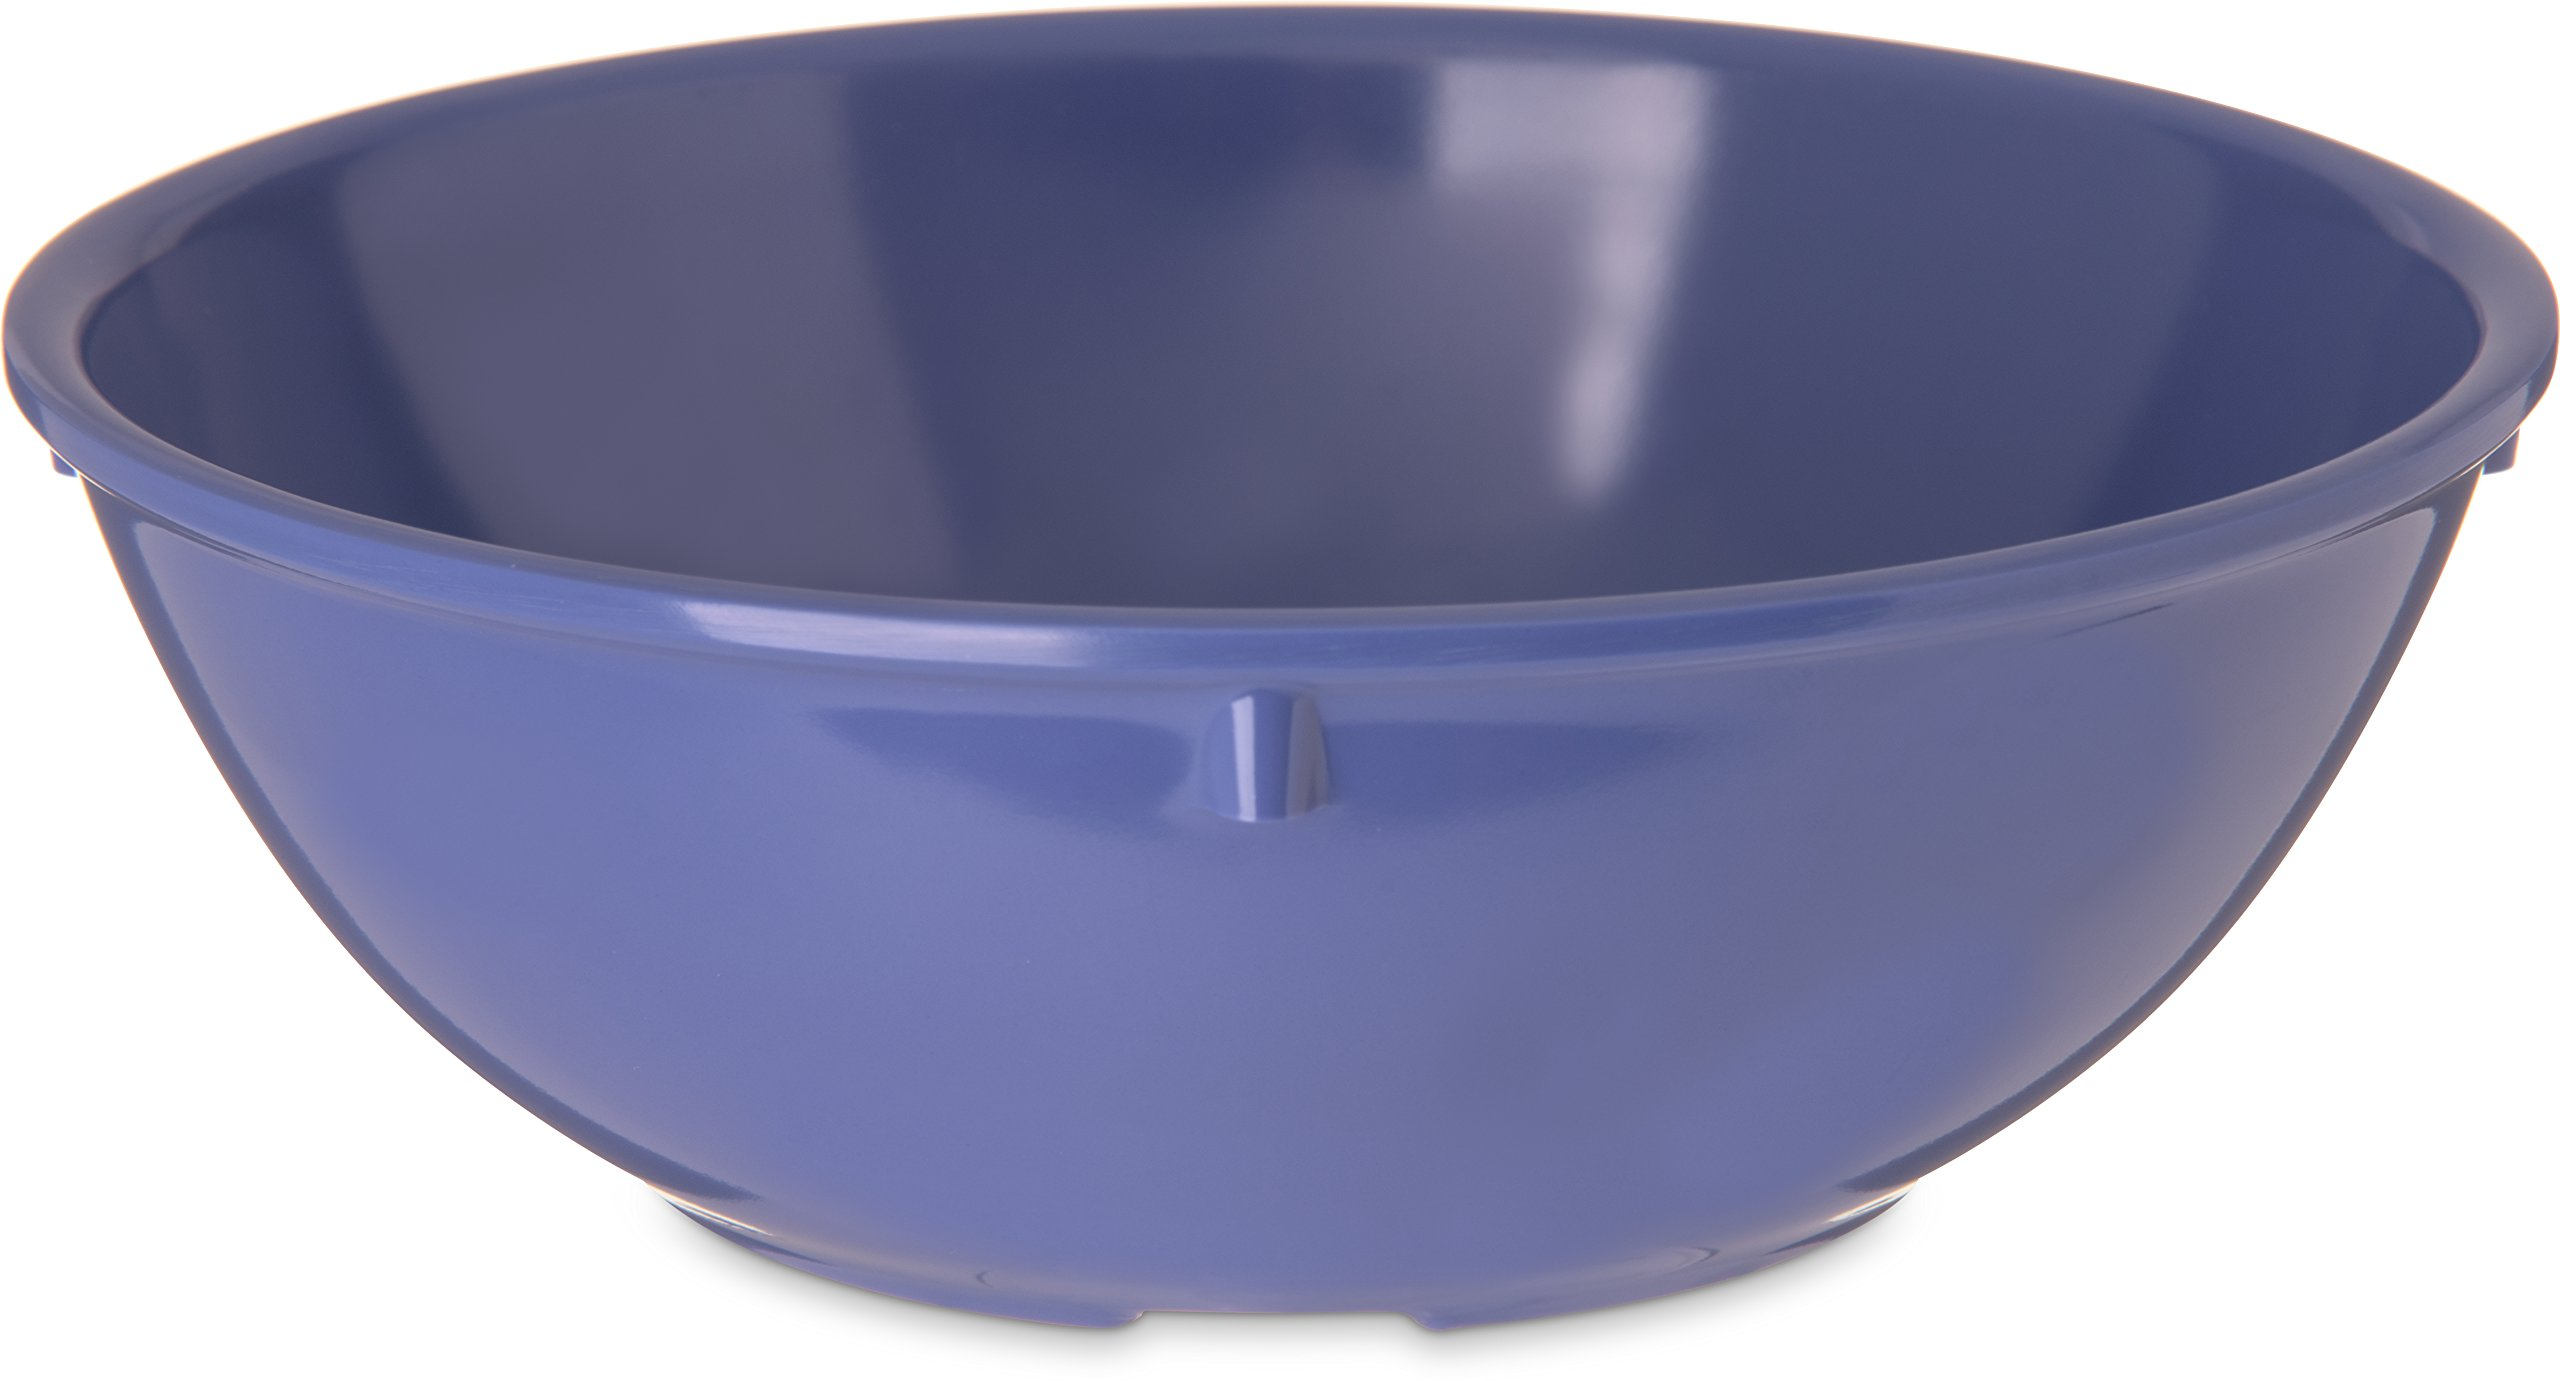 Carlisle 4352114 Dallas Ware Melamine Nappie Bowl, 14oz Capacity, 5.45'' Diameter x 1-15/16'' Height x 1-15/16'' Depth, Ocean Blue (Case of 48)